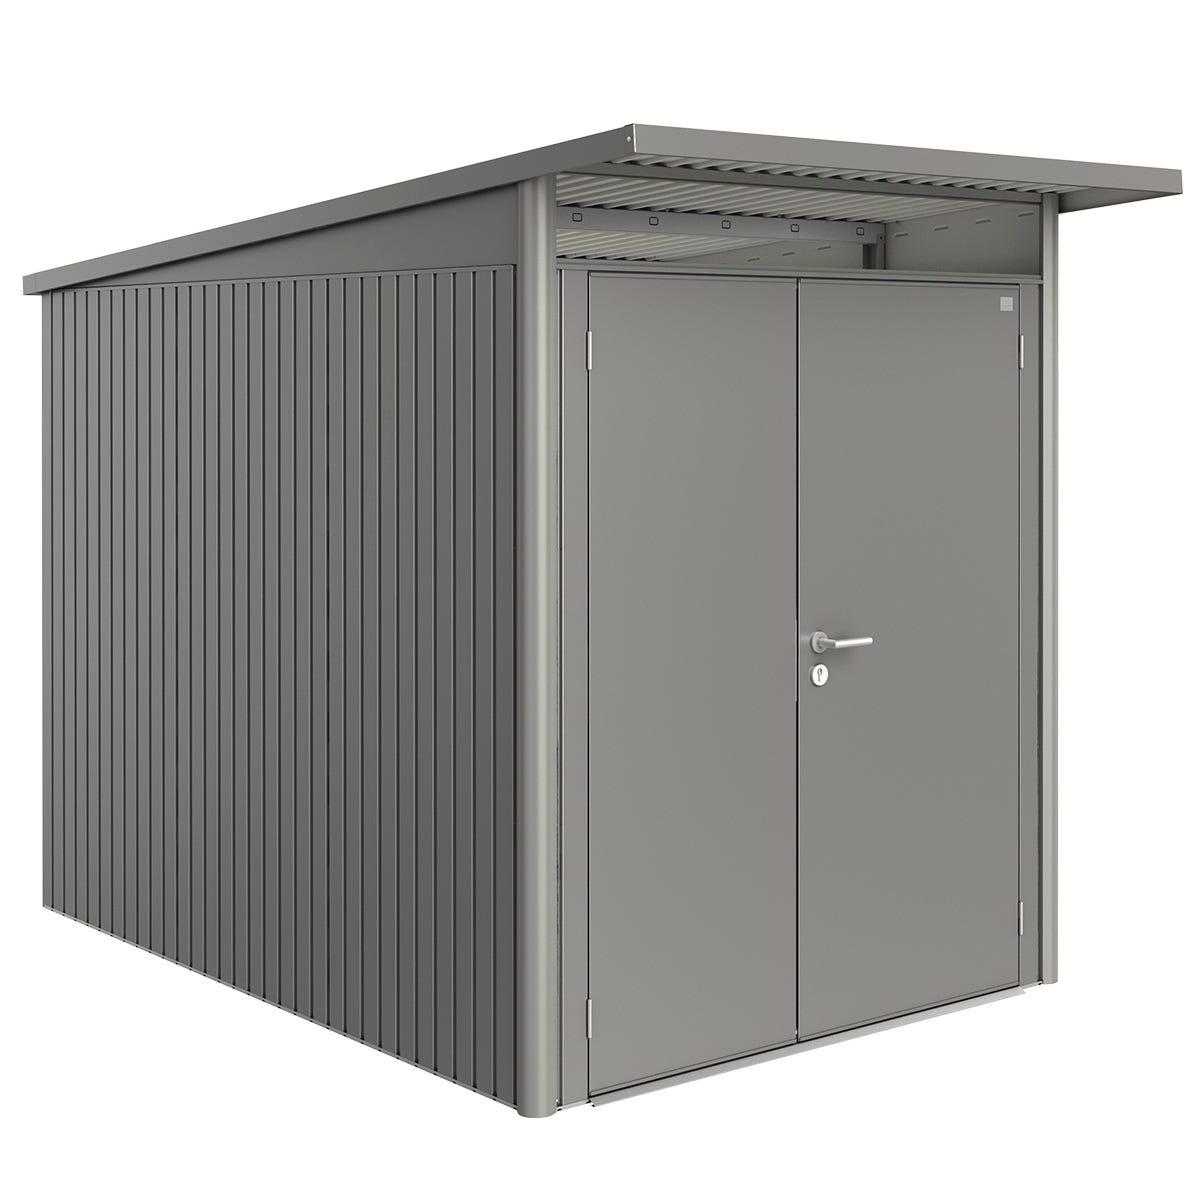 Biohort AvantGarde Metal Shed A3 Double door 5' 9'' x 9' 8'' - Quartz Grey